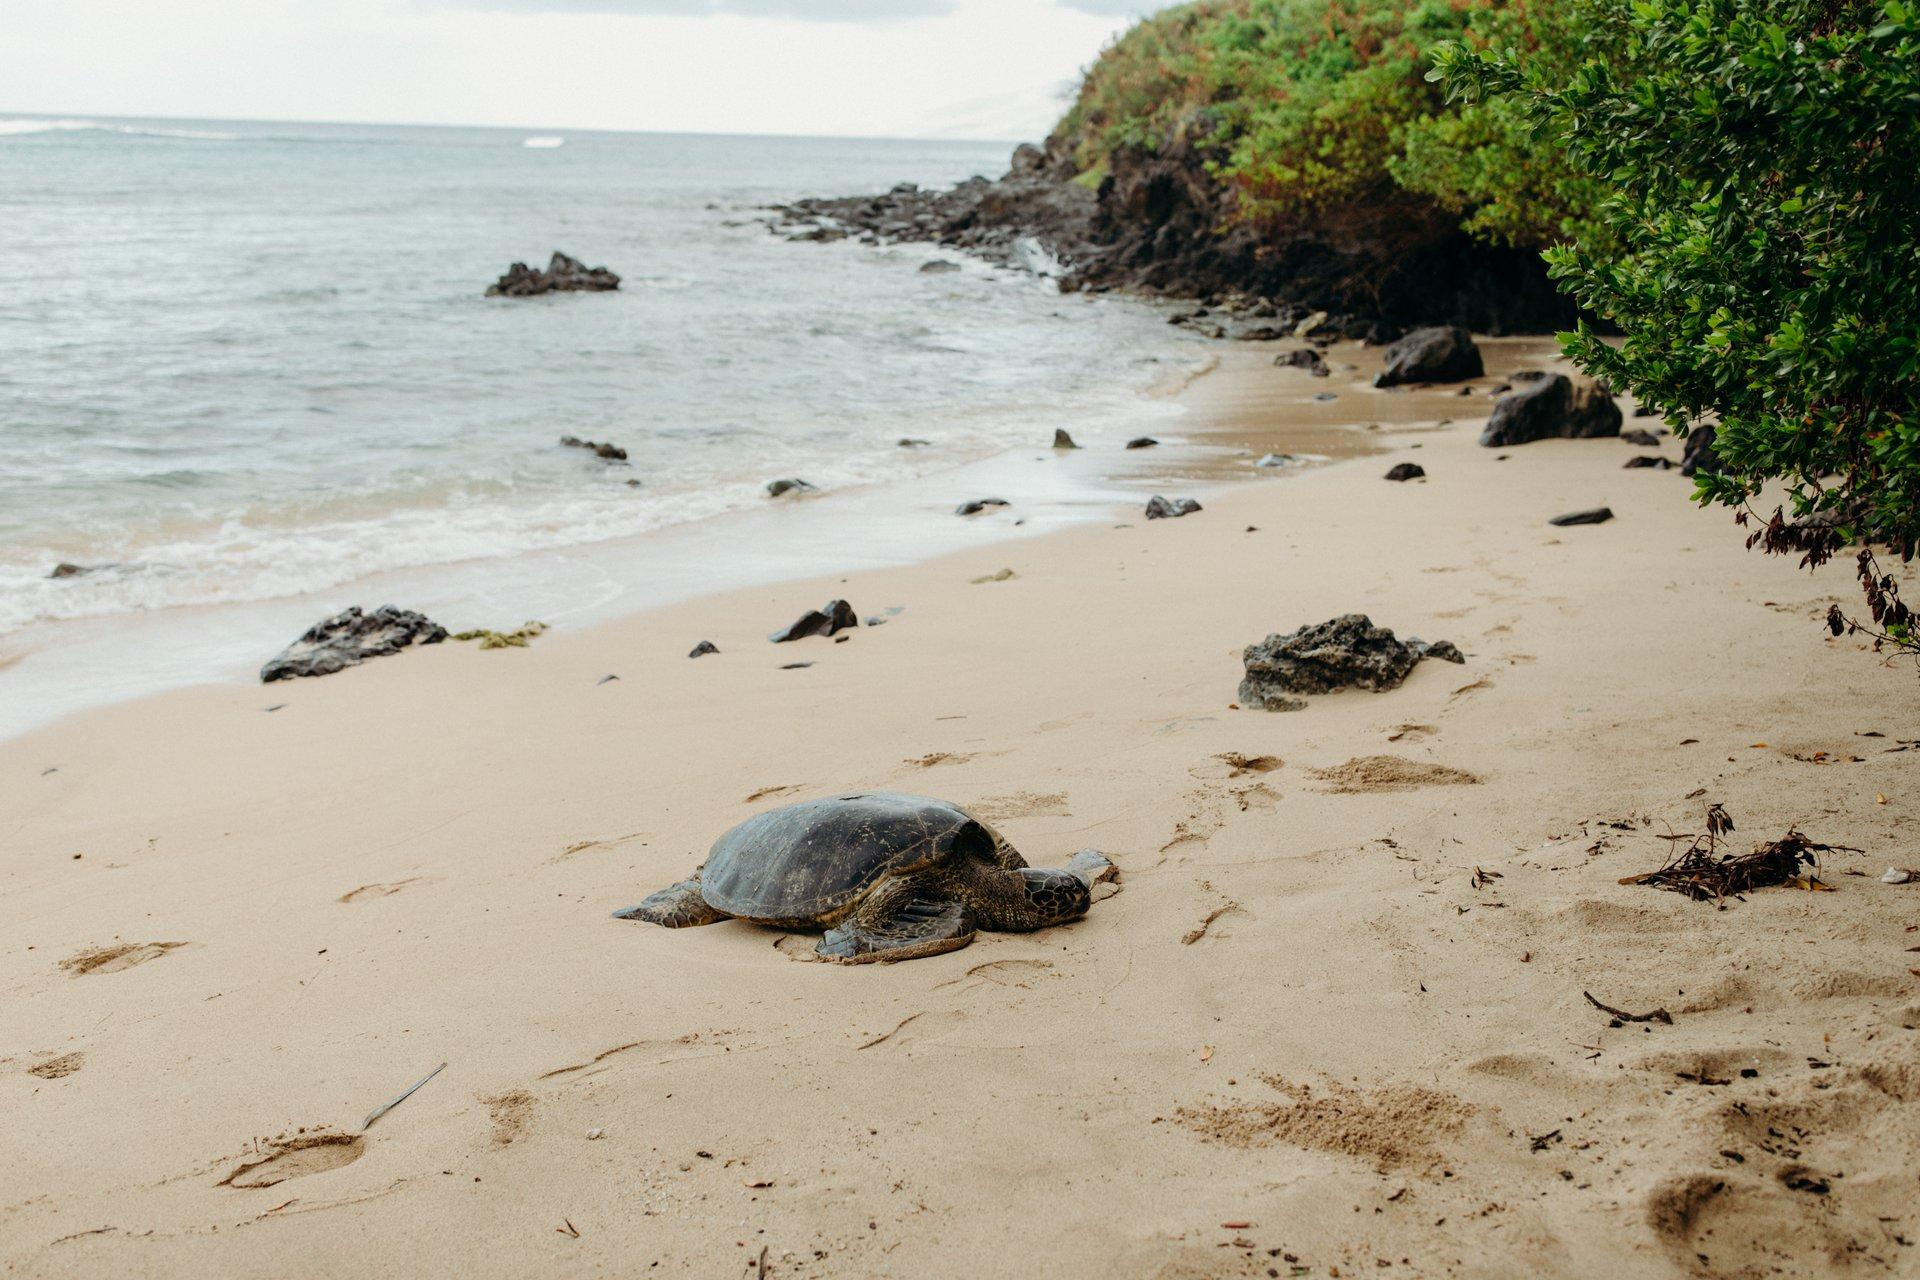 Maui-USA-travel-story-Flytographer-4